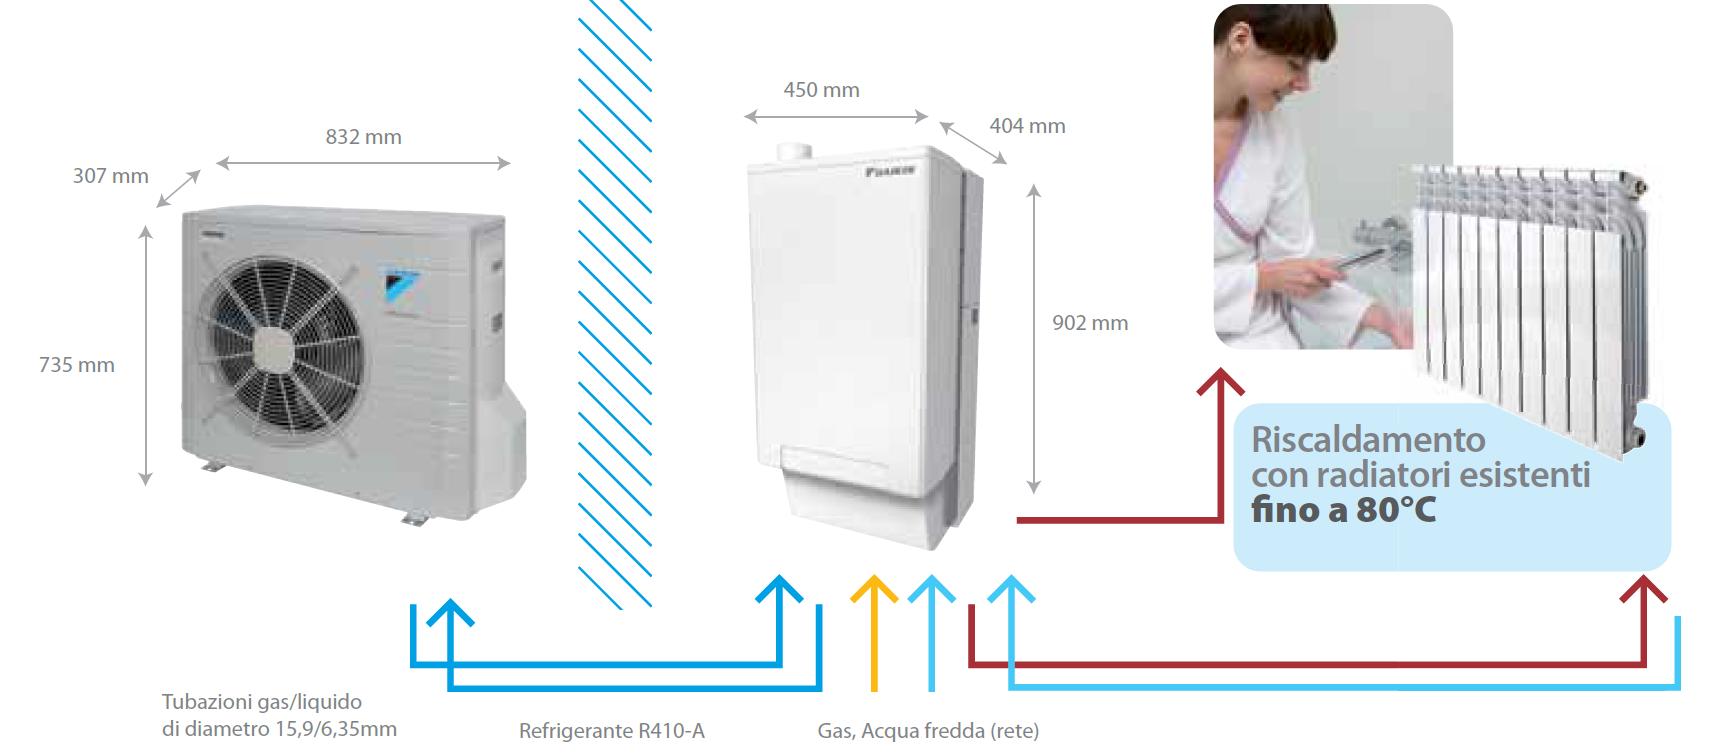 Quanto costa una caldaia quanto costa una caldaia quanto for Quanto costa un filtro abitacolo